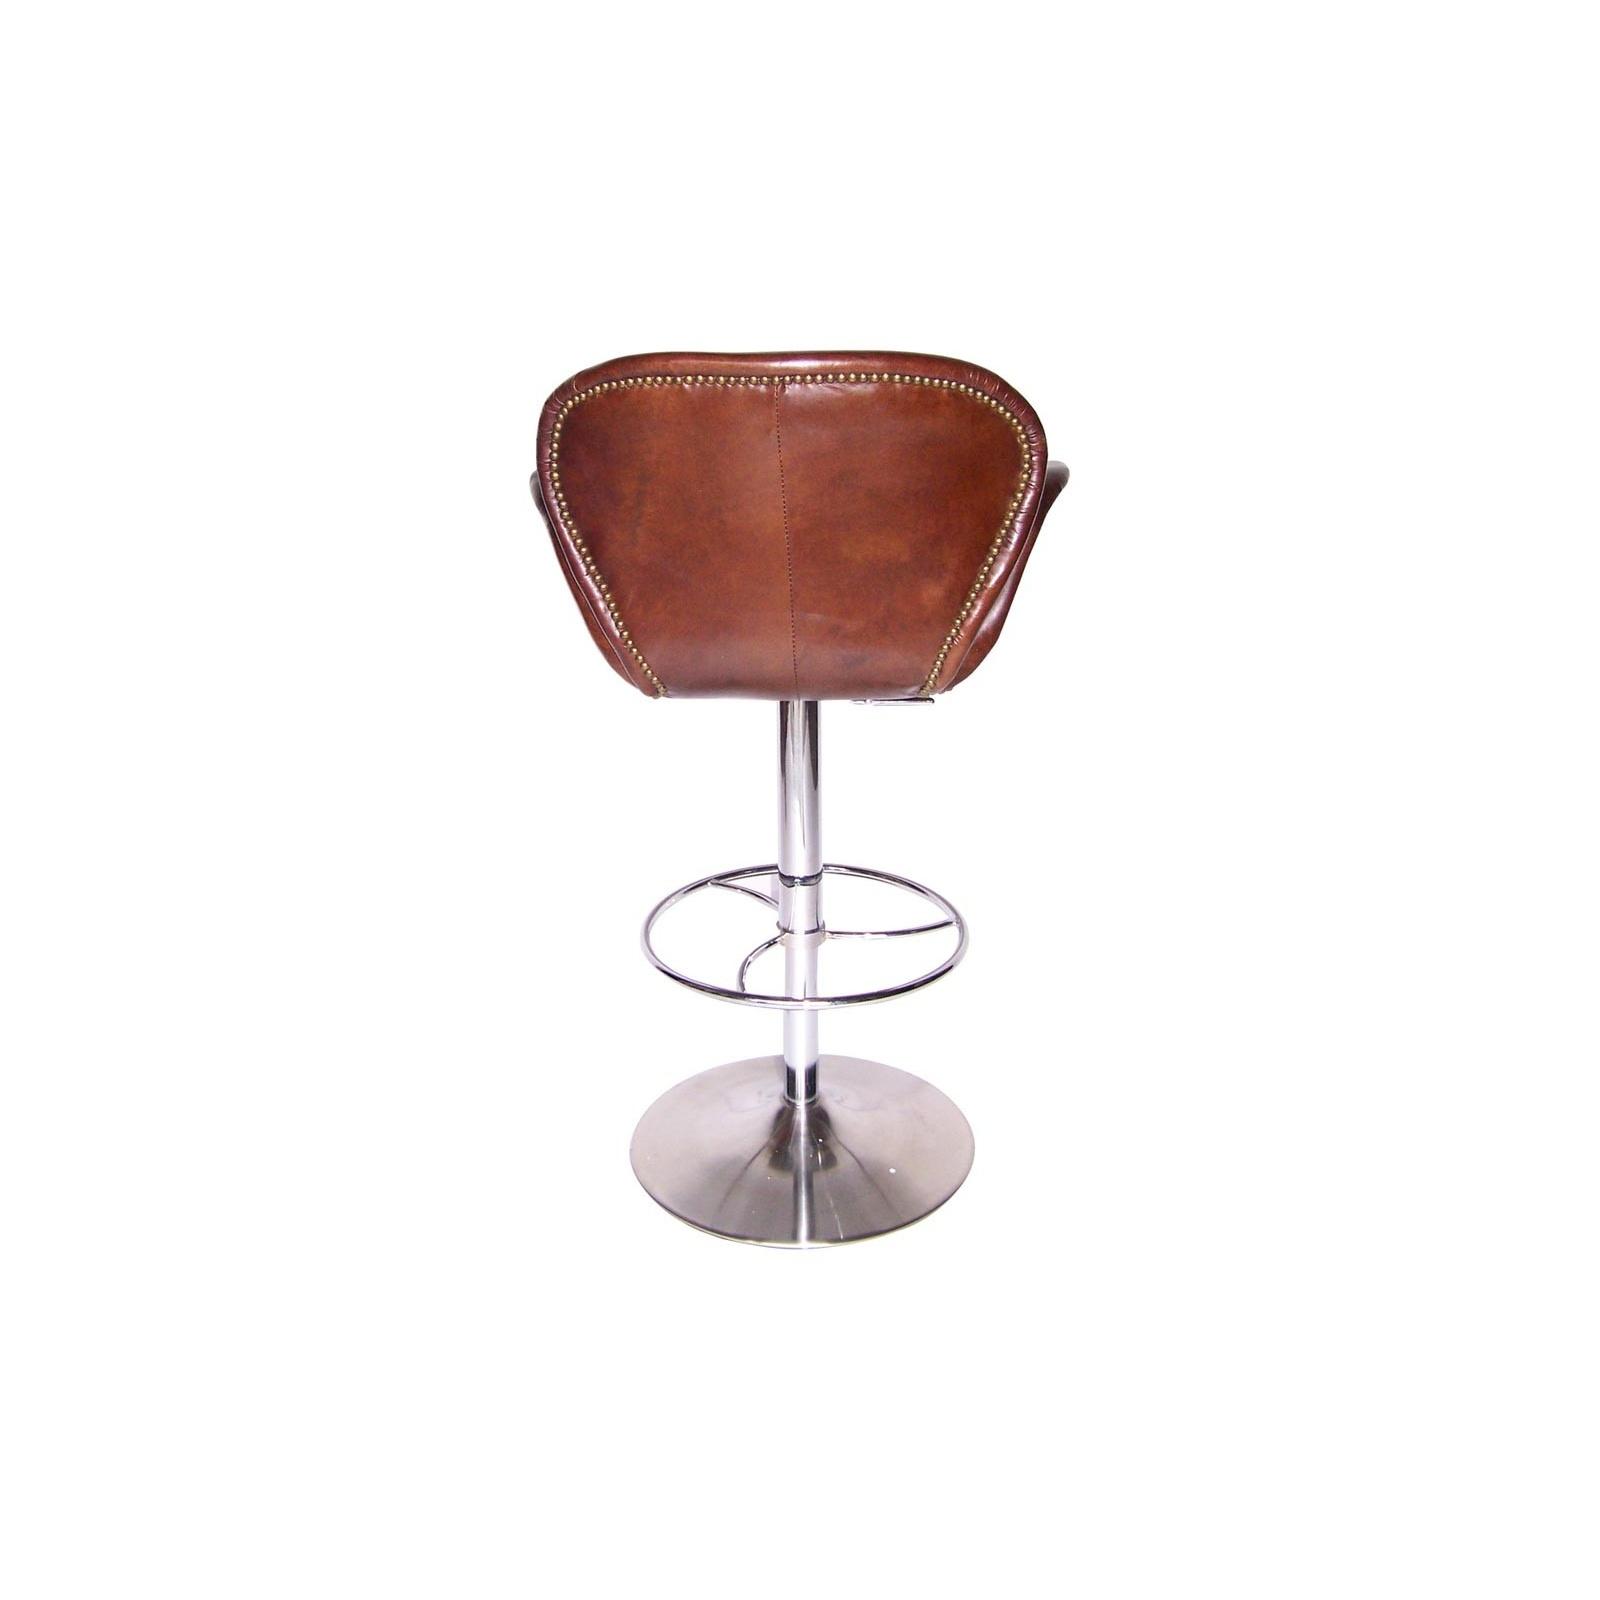 fauteuil de bar. Black Bedroom Furniture Sets. Home Design Ideas